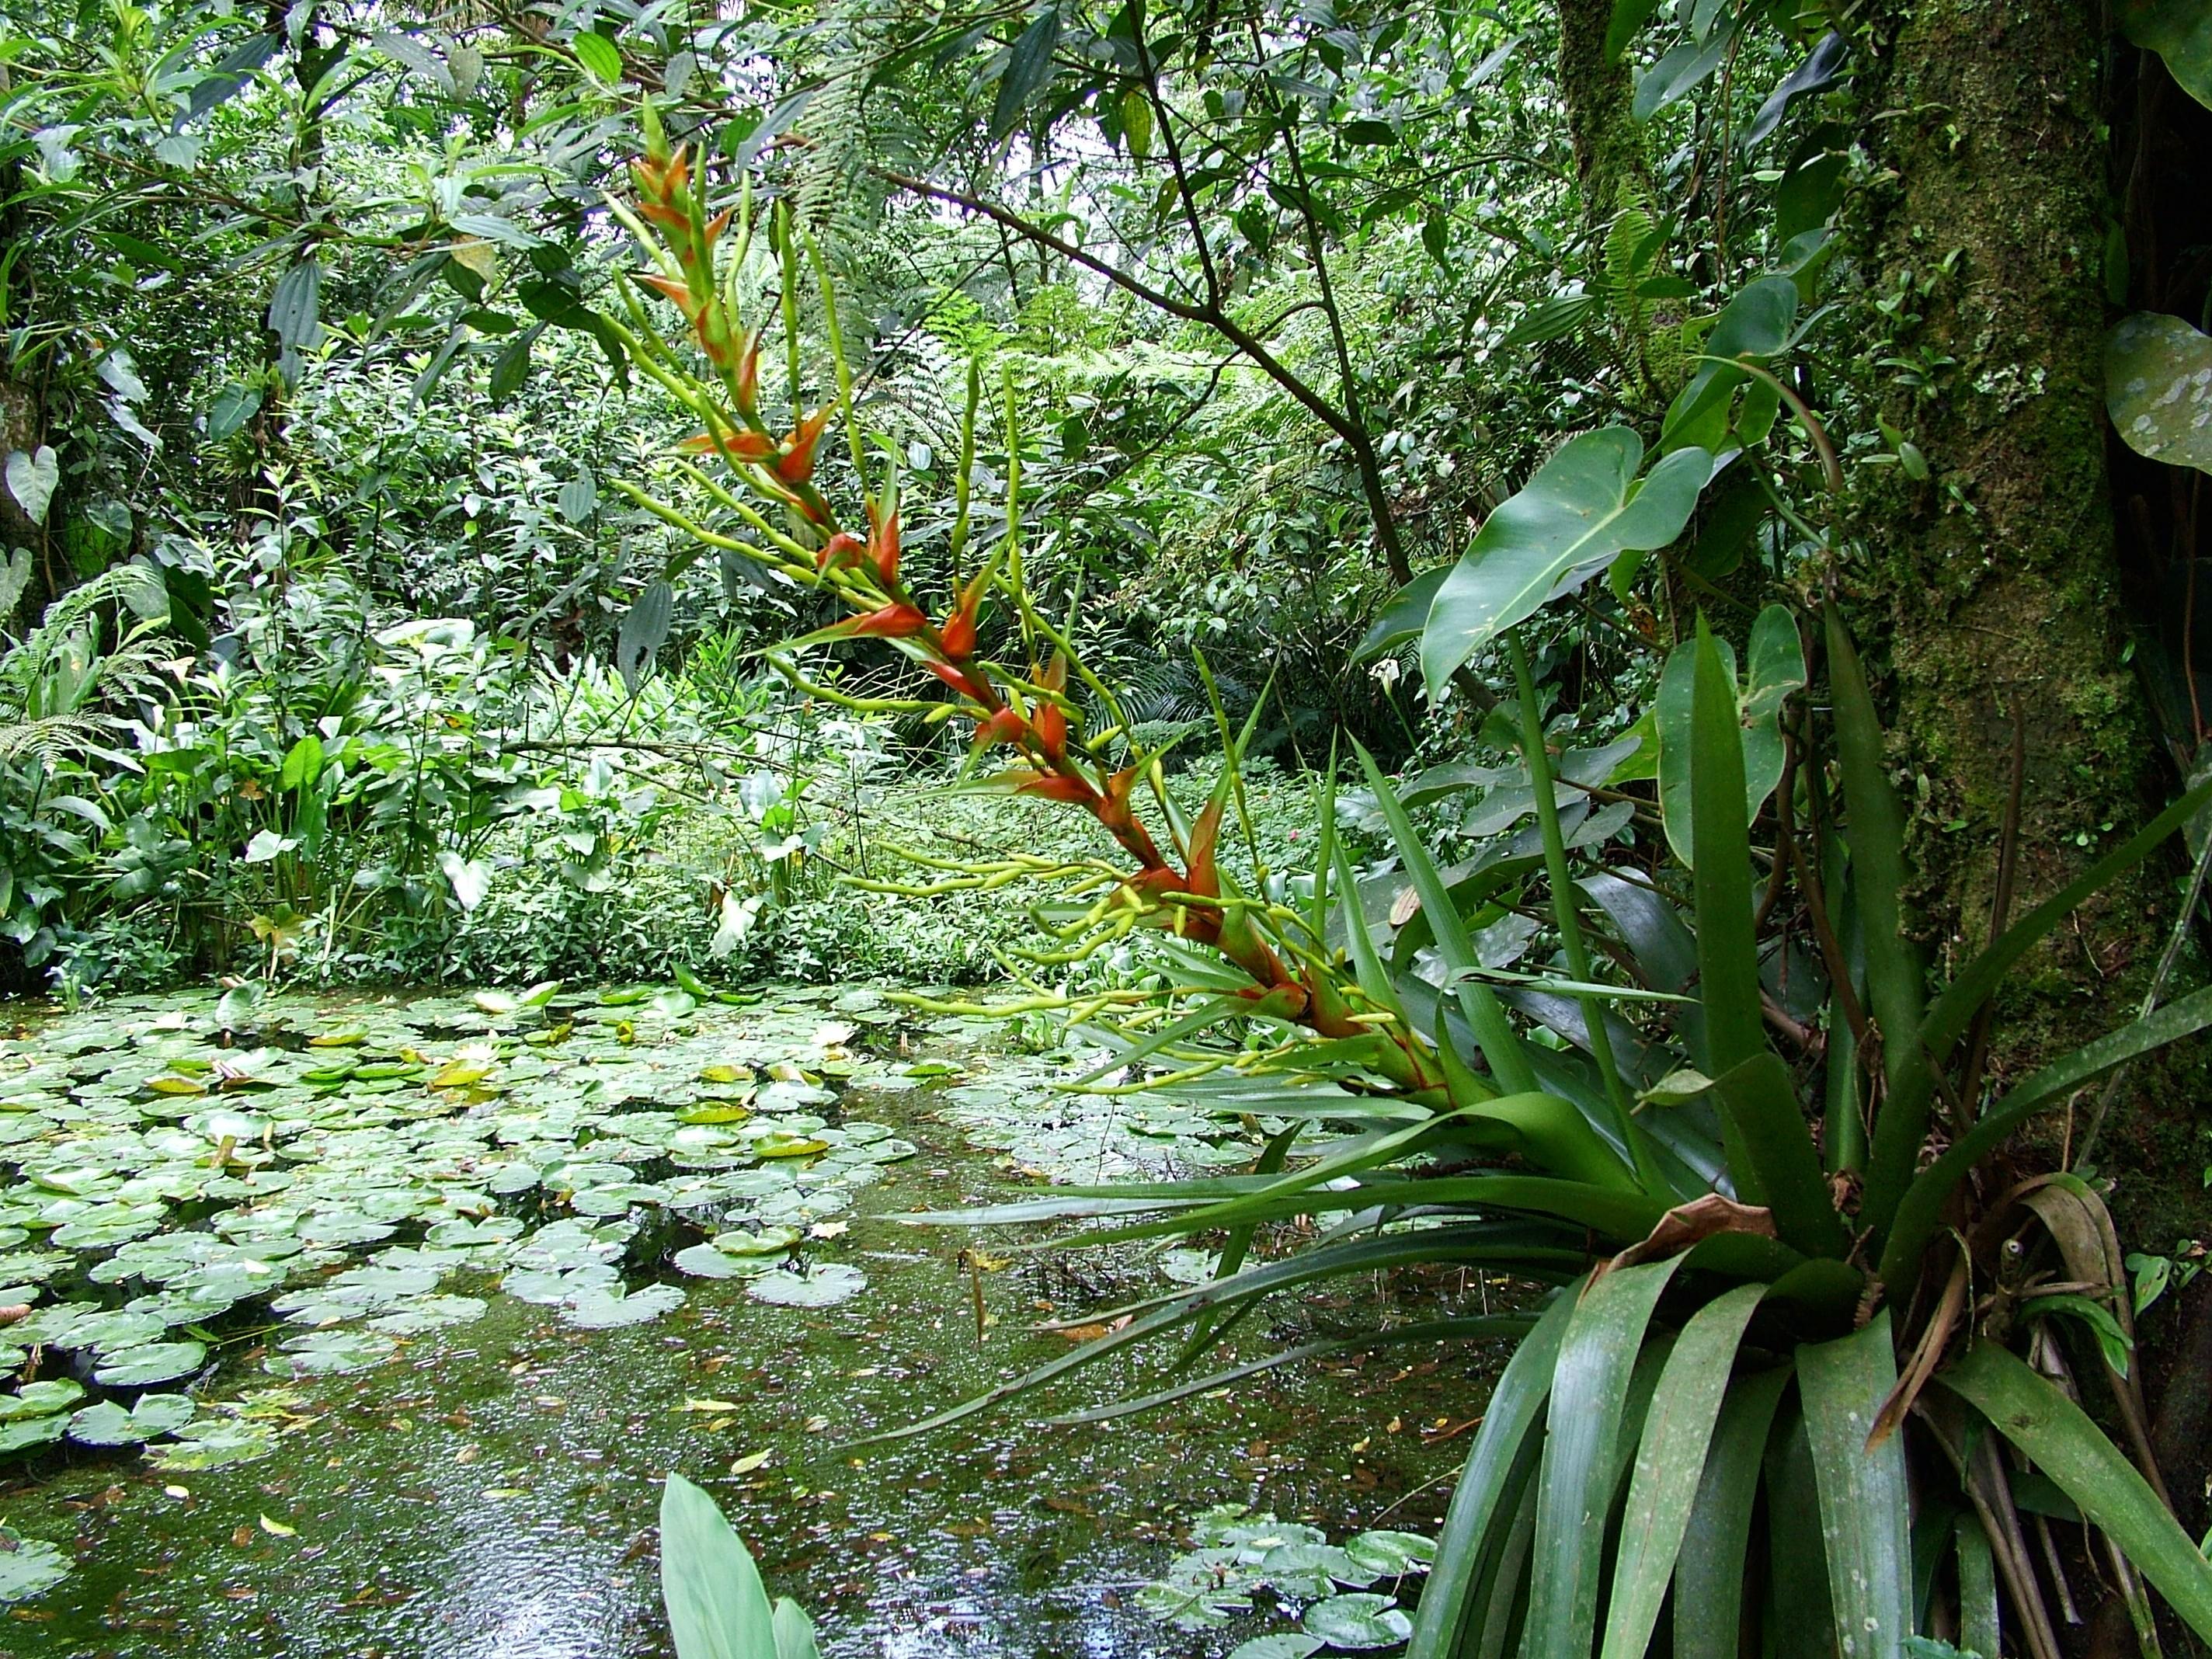 Rebio Paranapiacaba - Flora - margem do rio